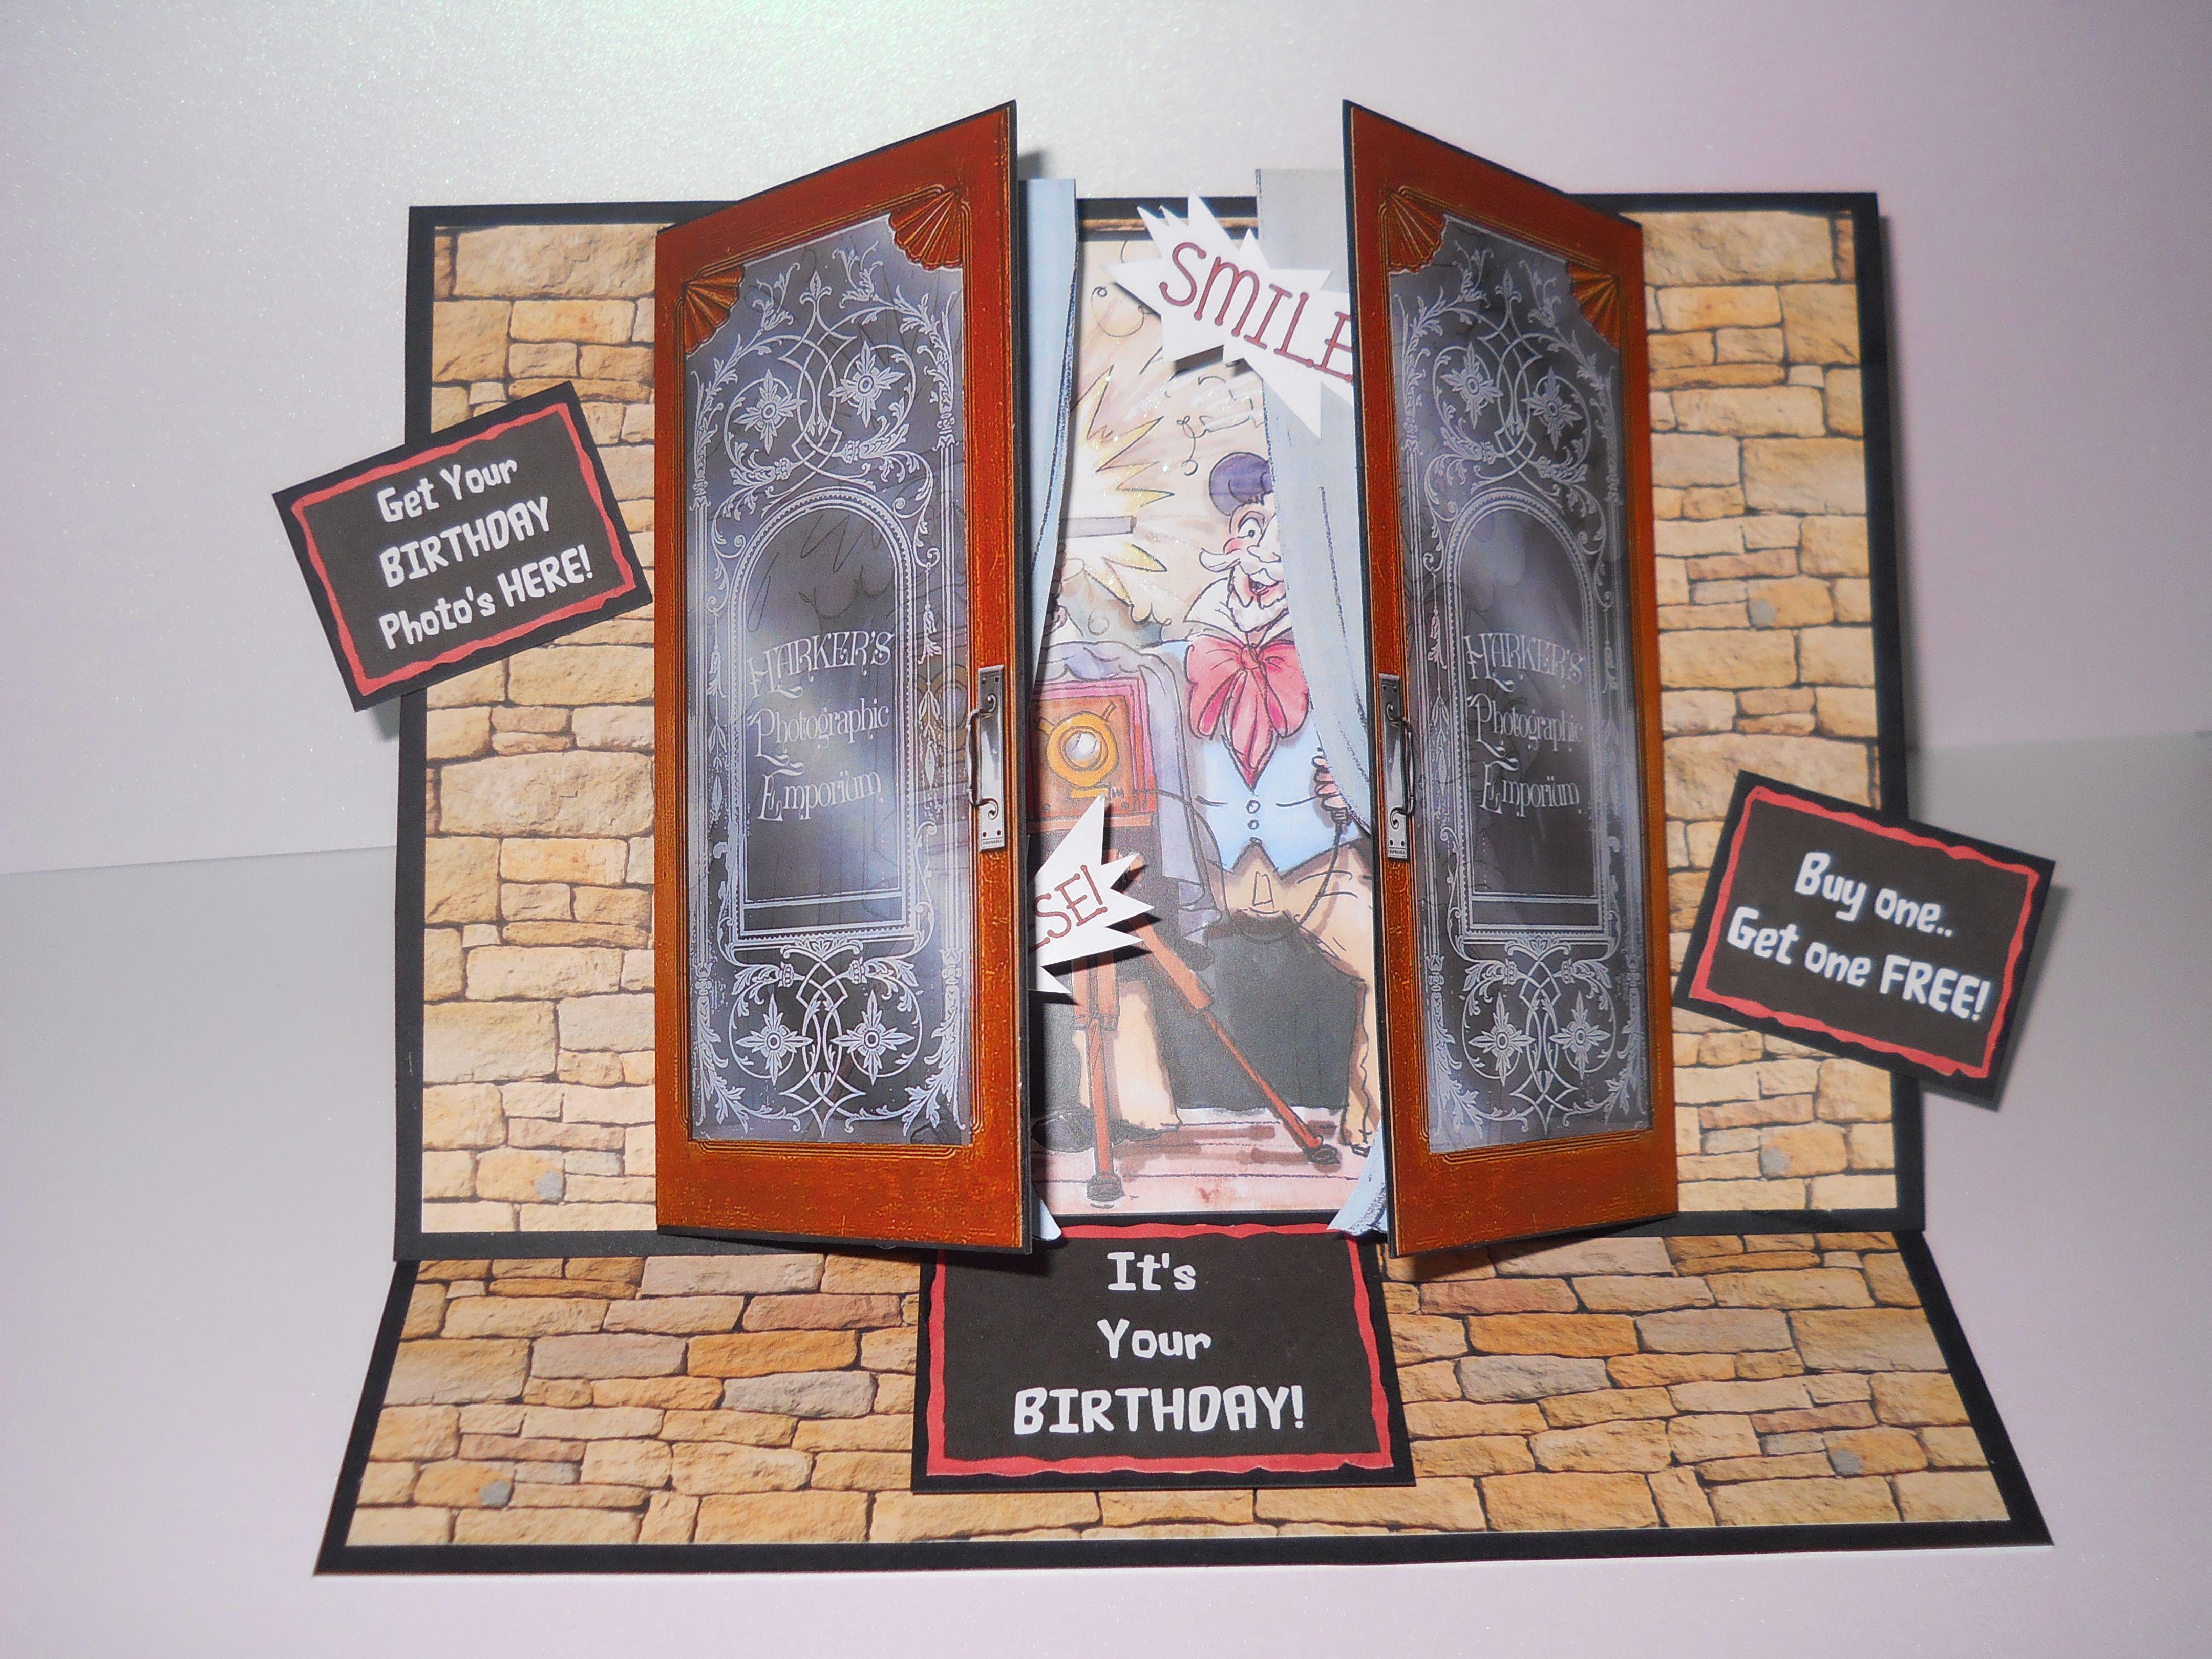 La Pashe- Open Doors CD Rom & La Pashe- Open Doors CD Rom | Nicole Bretherick Designs | Pinterest Pezcame.Com